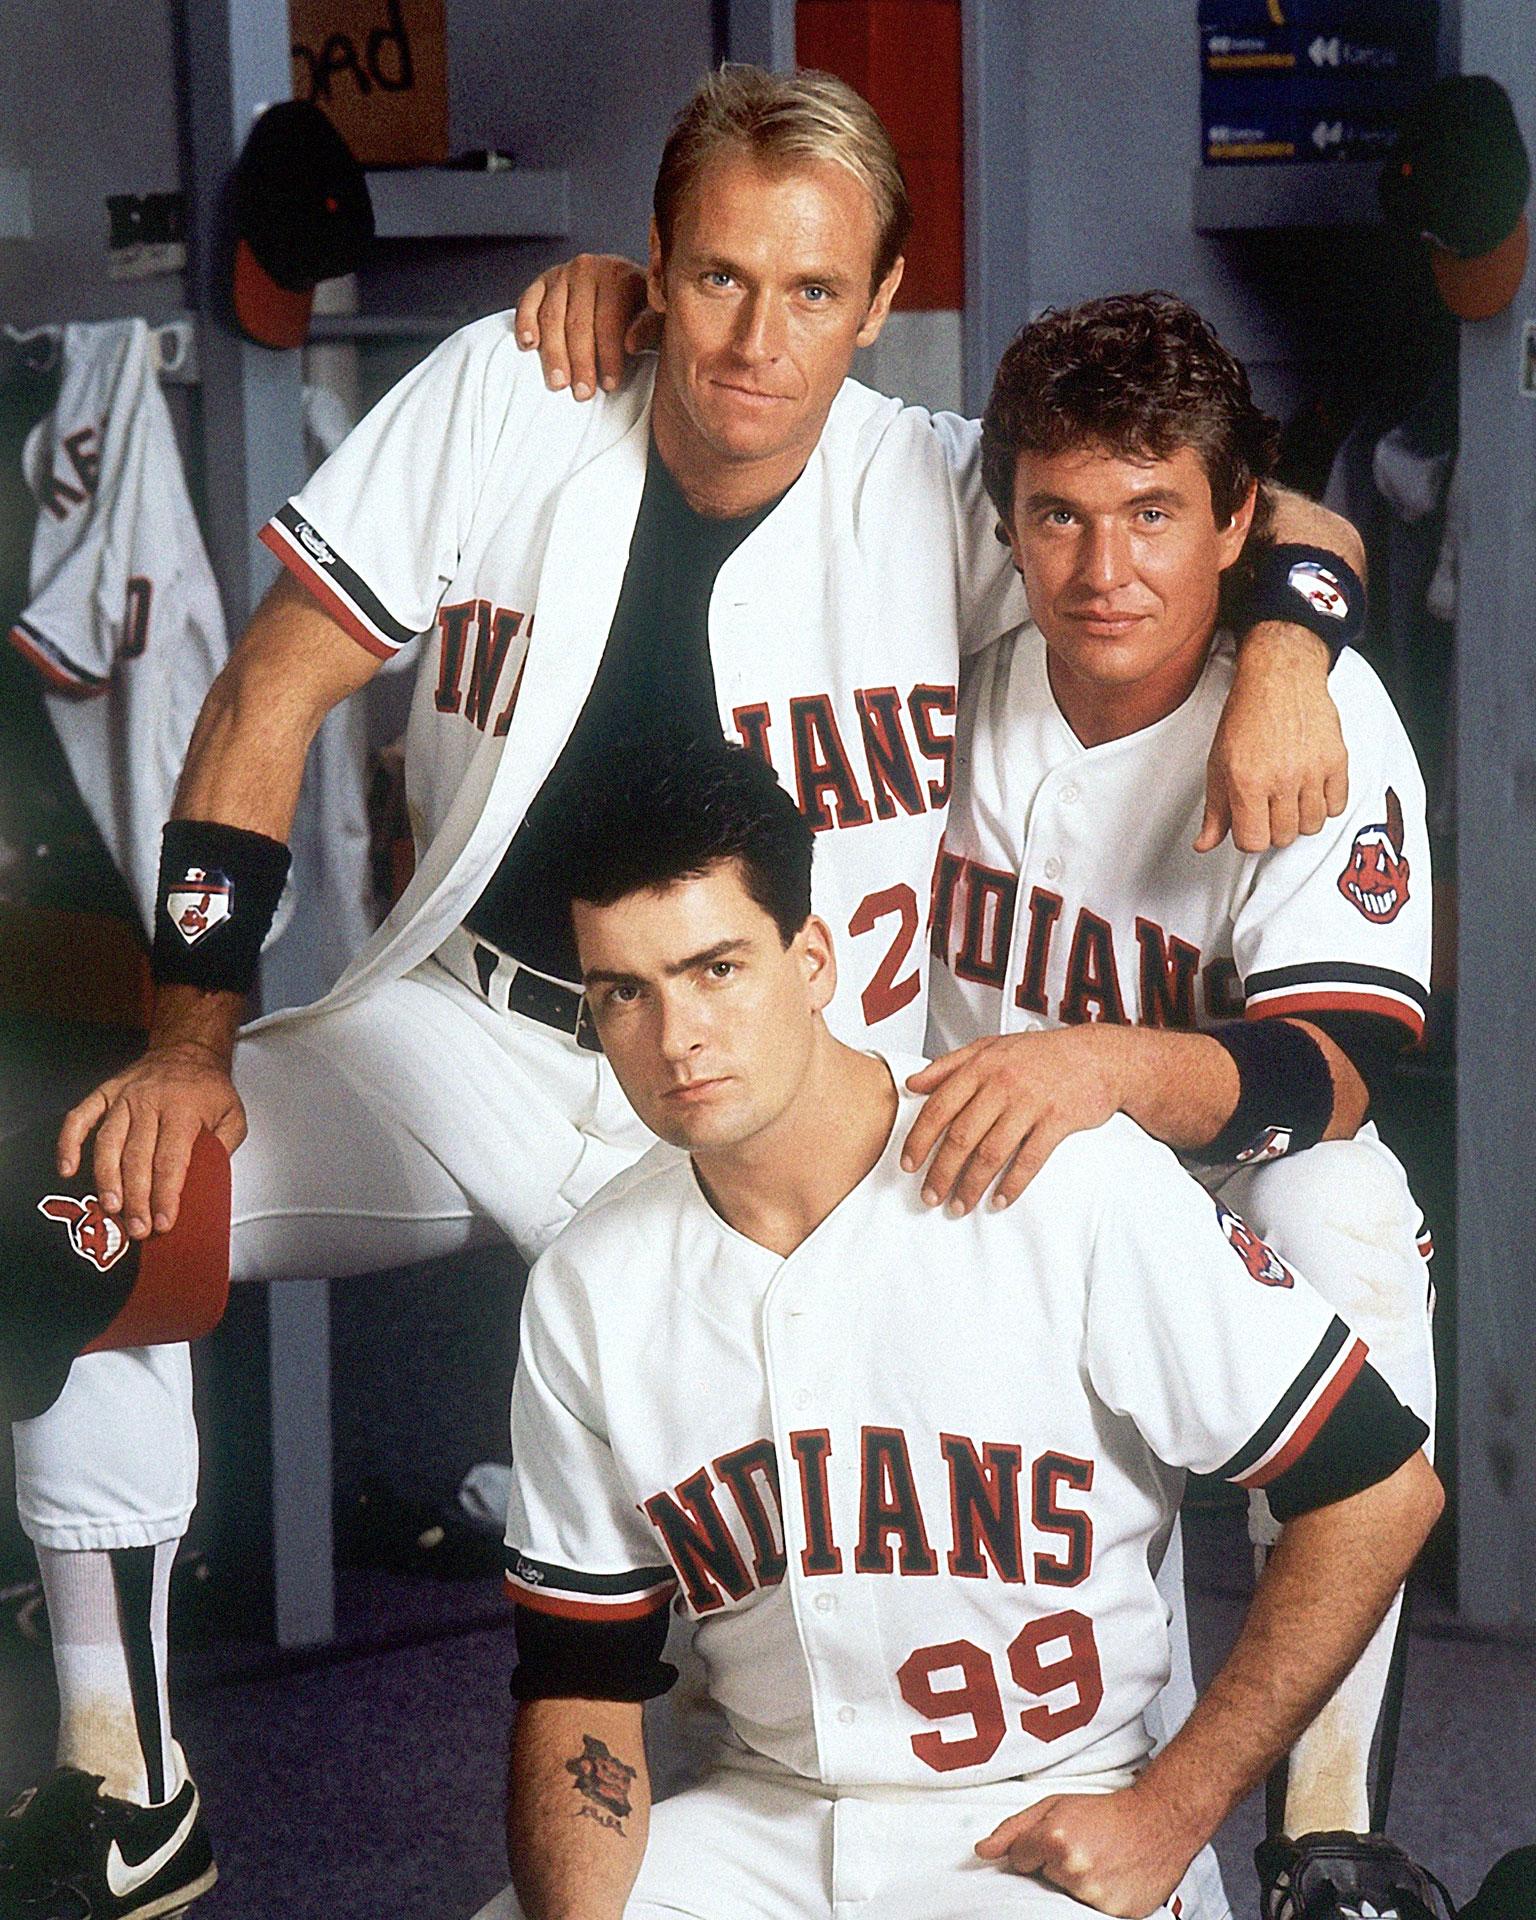 Top 10 Baseball Movies The: SportsNation Speaks: Best Baseball